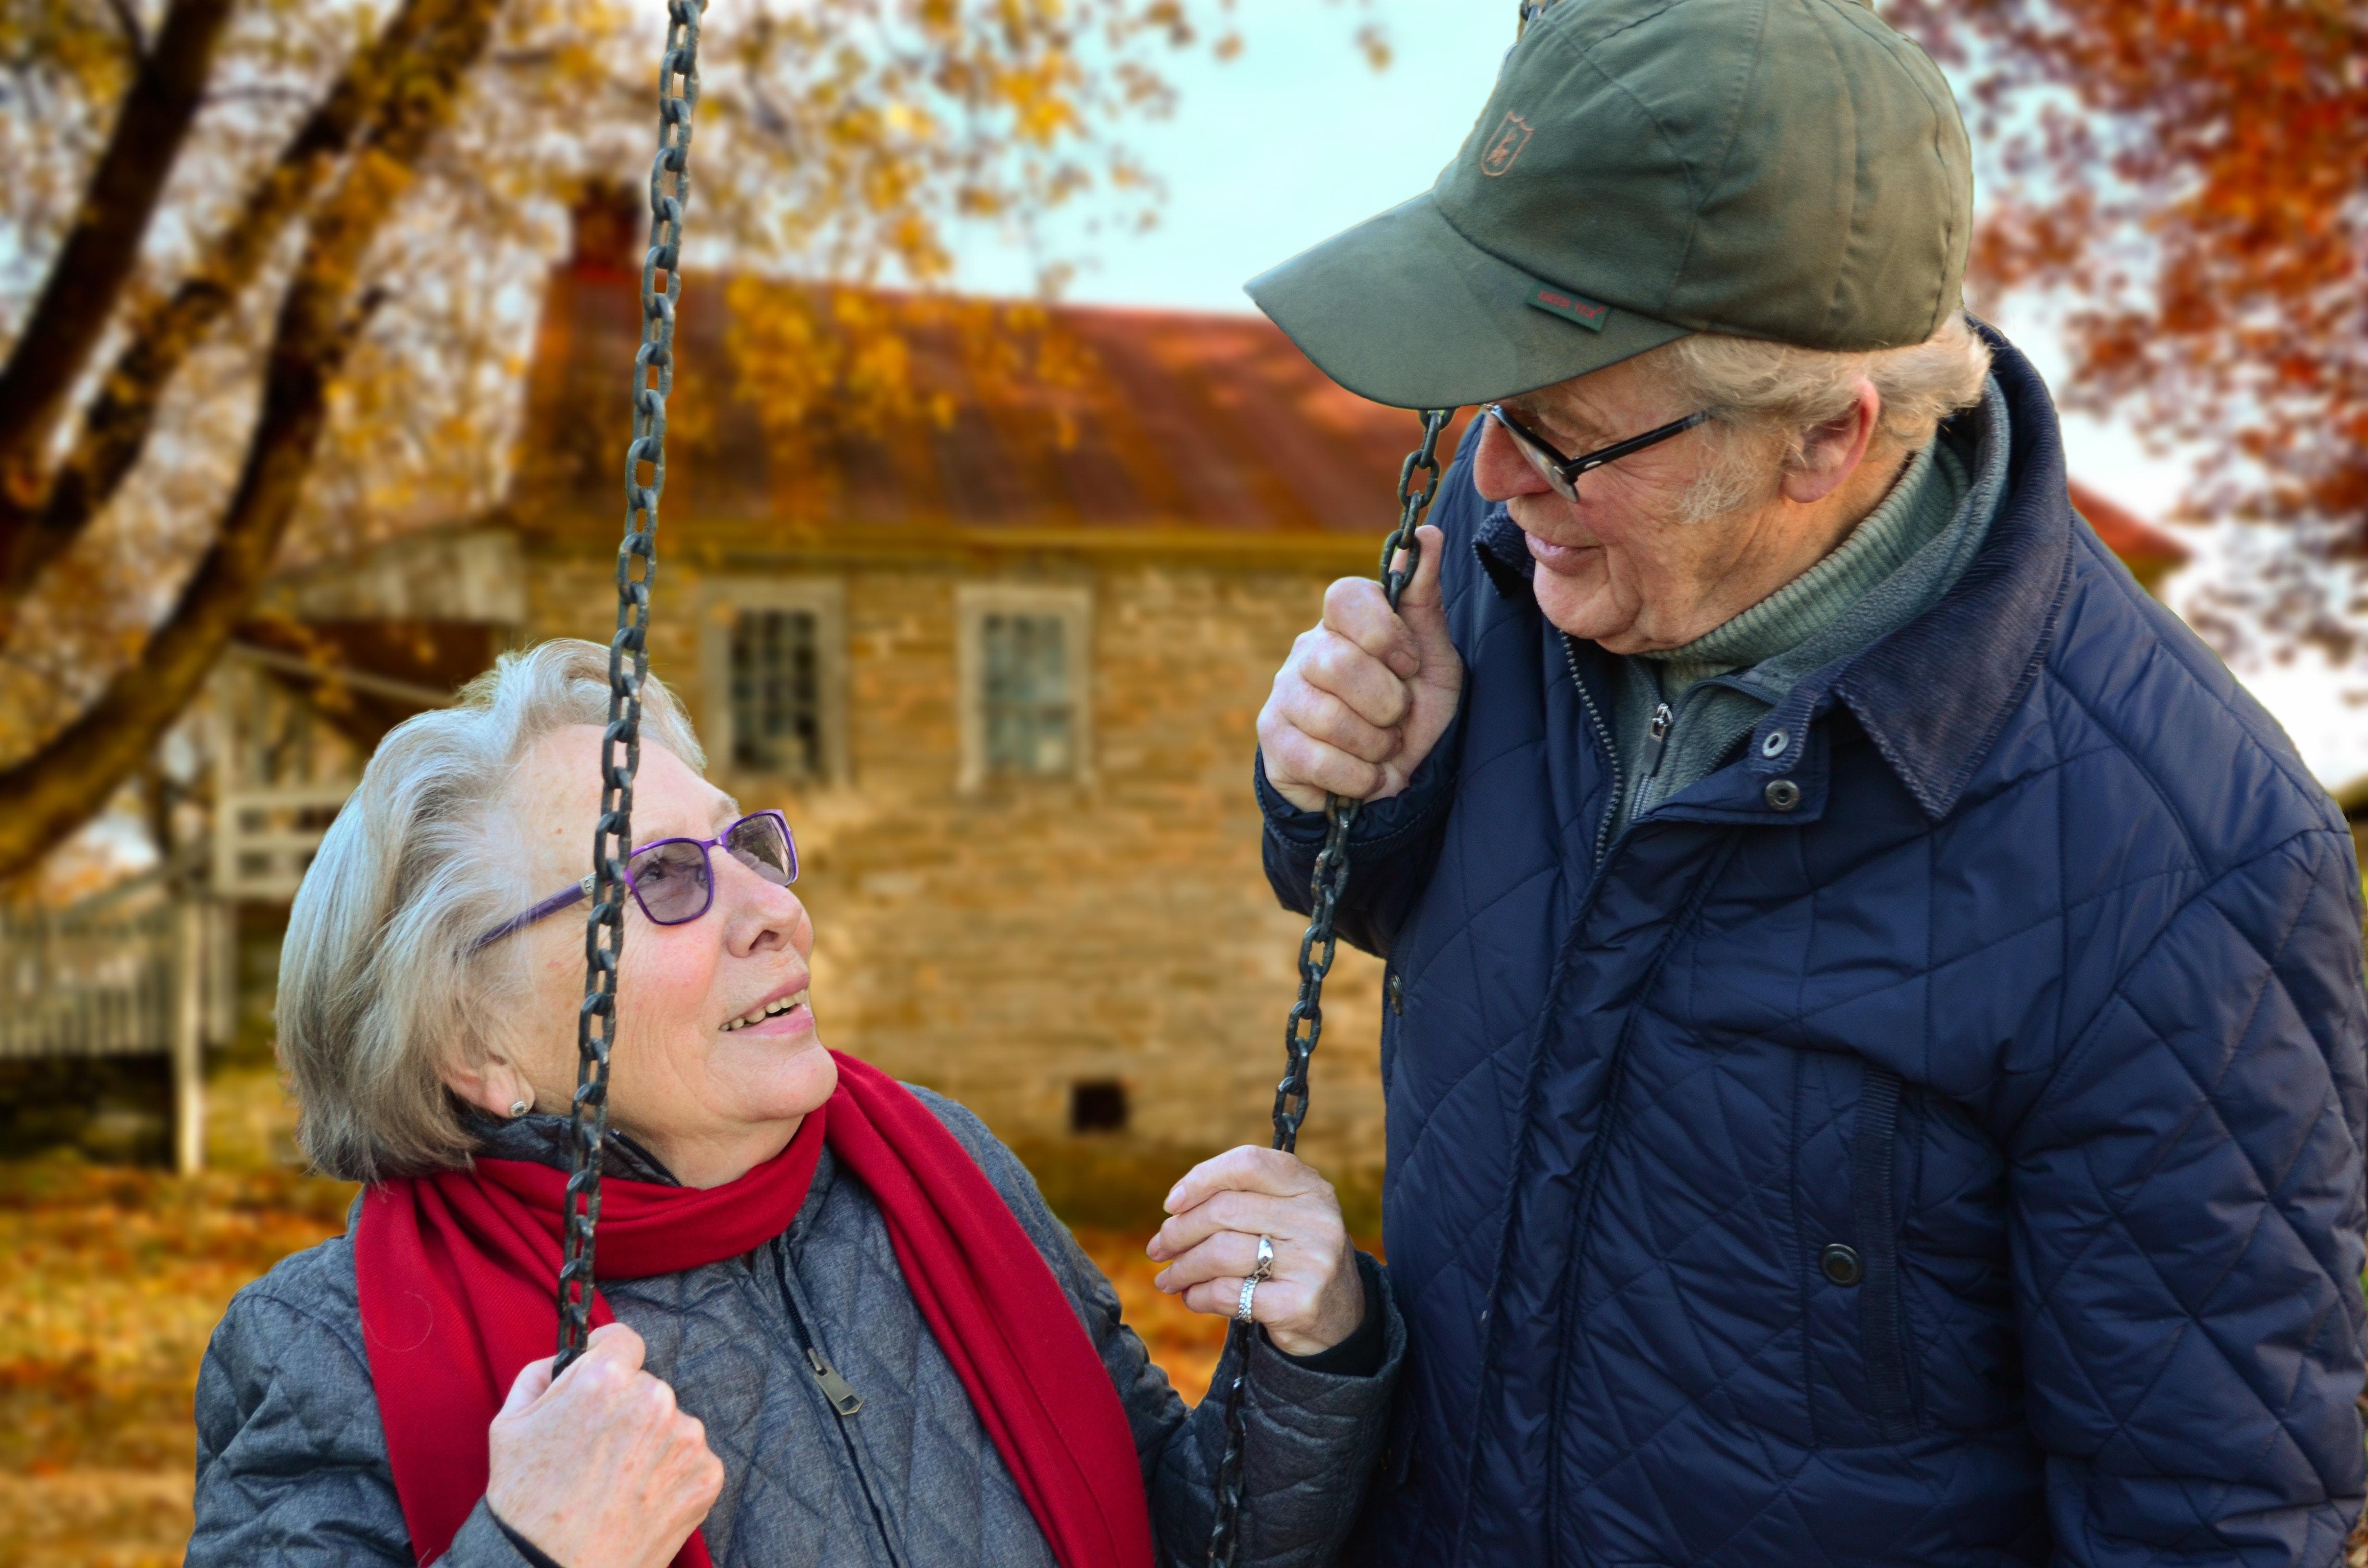 care-chain-couple-34761